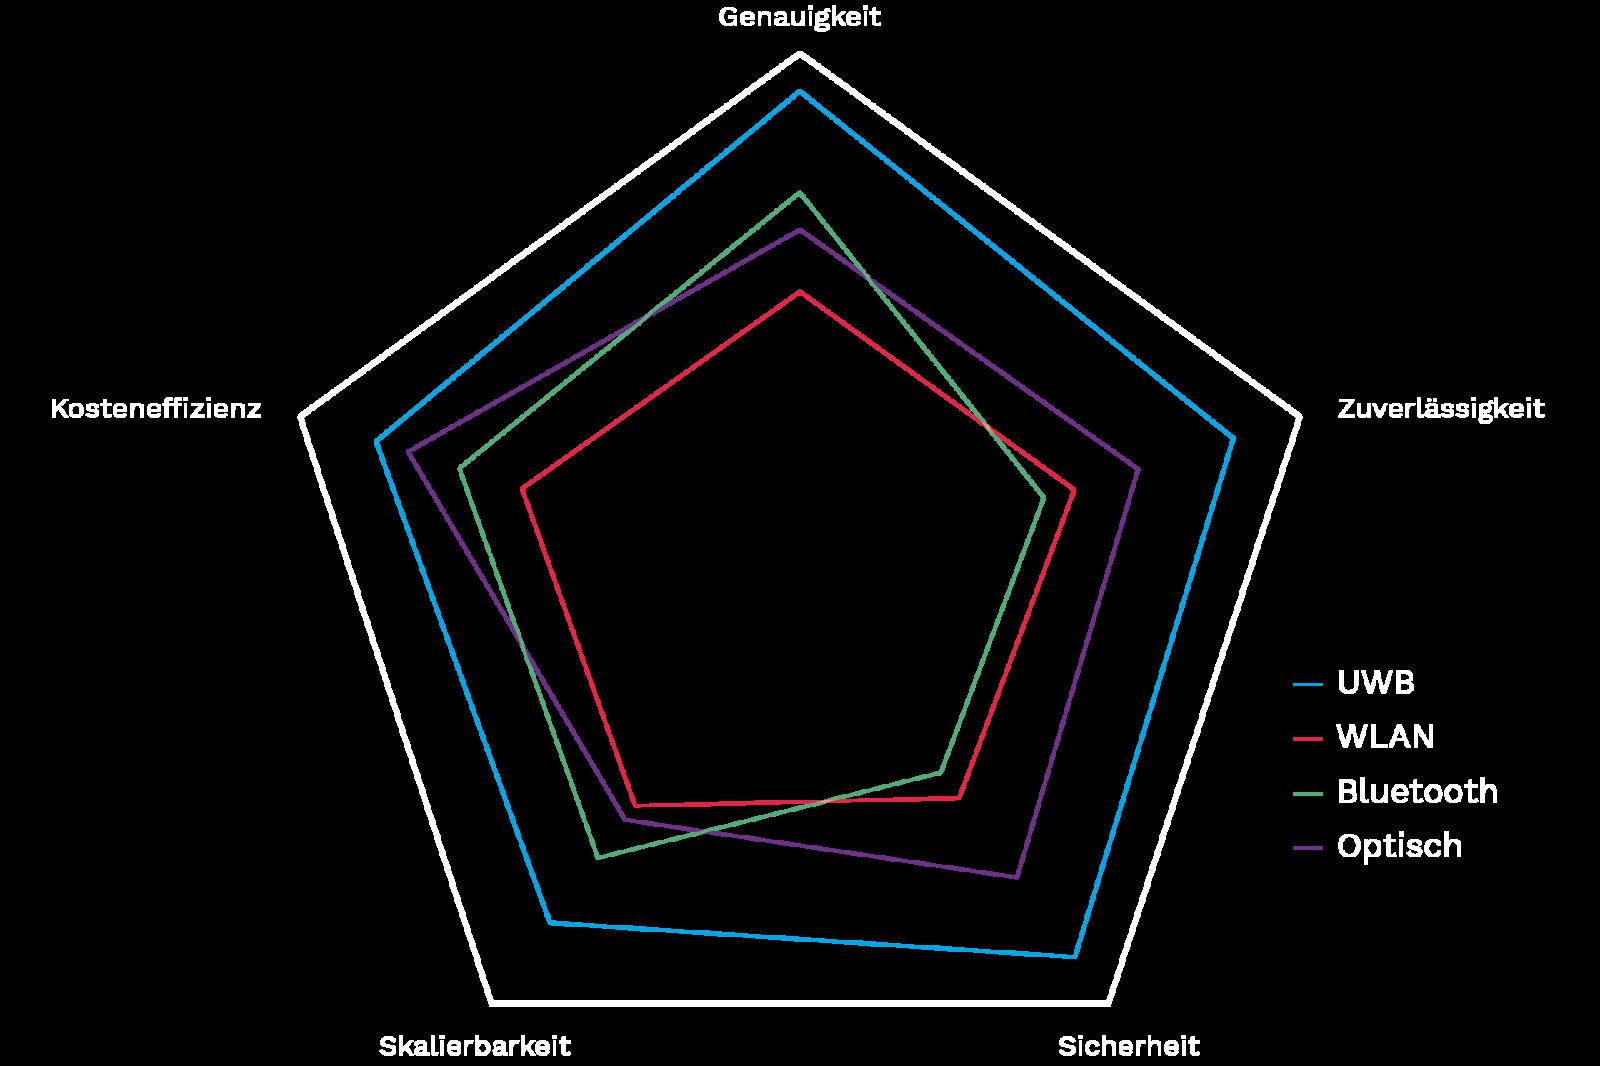 Ultrabreitband Tracking Technologie Vergleich